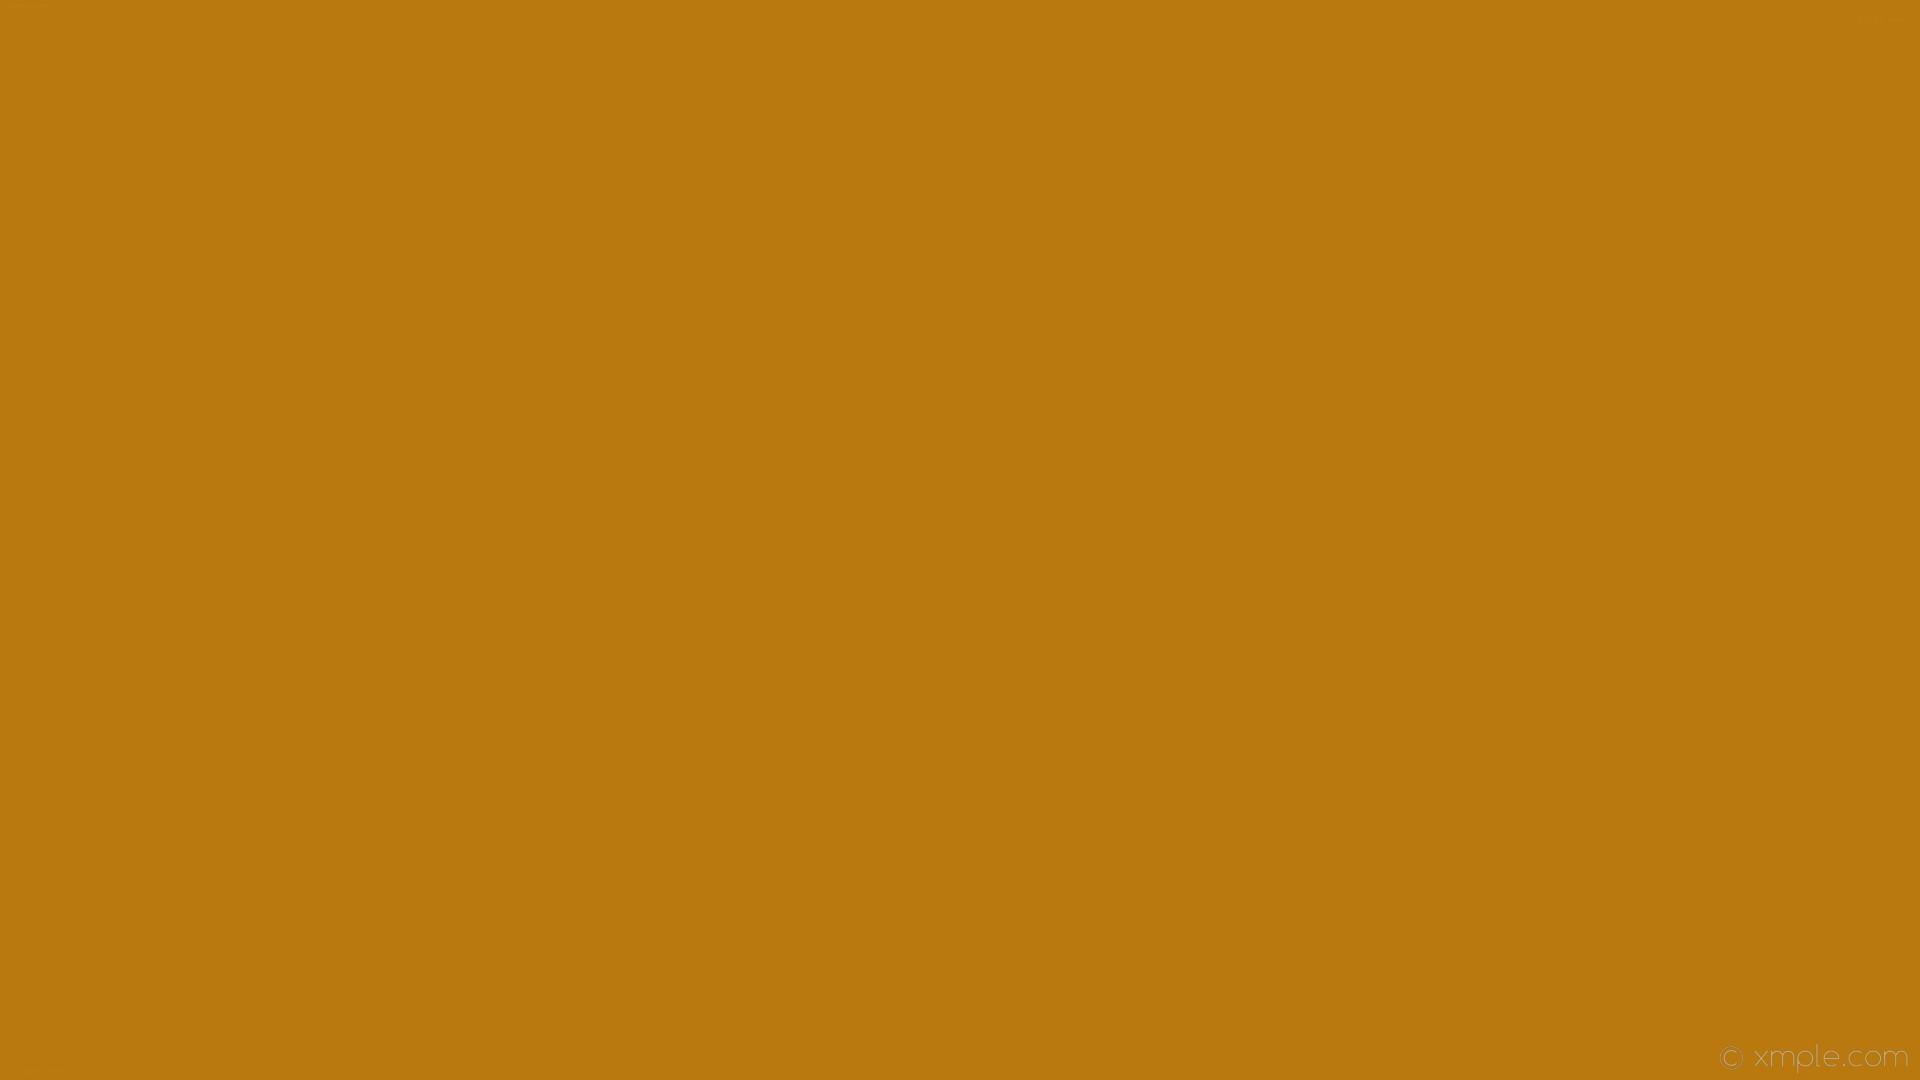 wallpaper one colour solid color single plain orange #b9790f